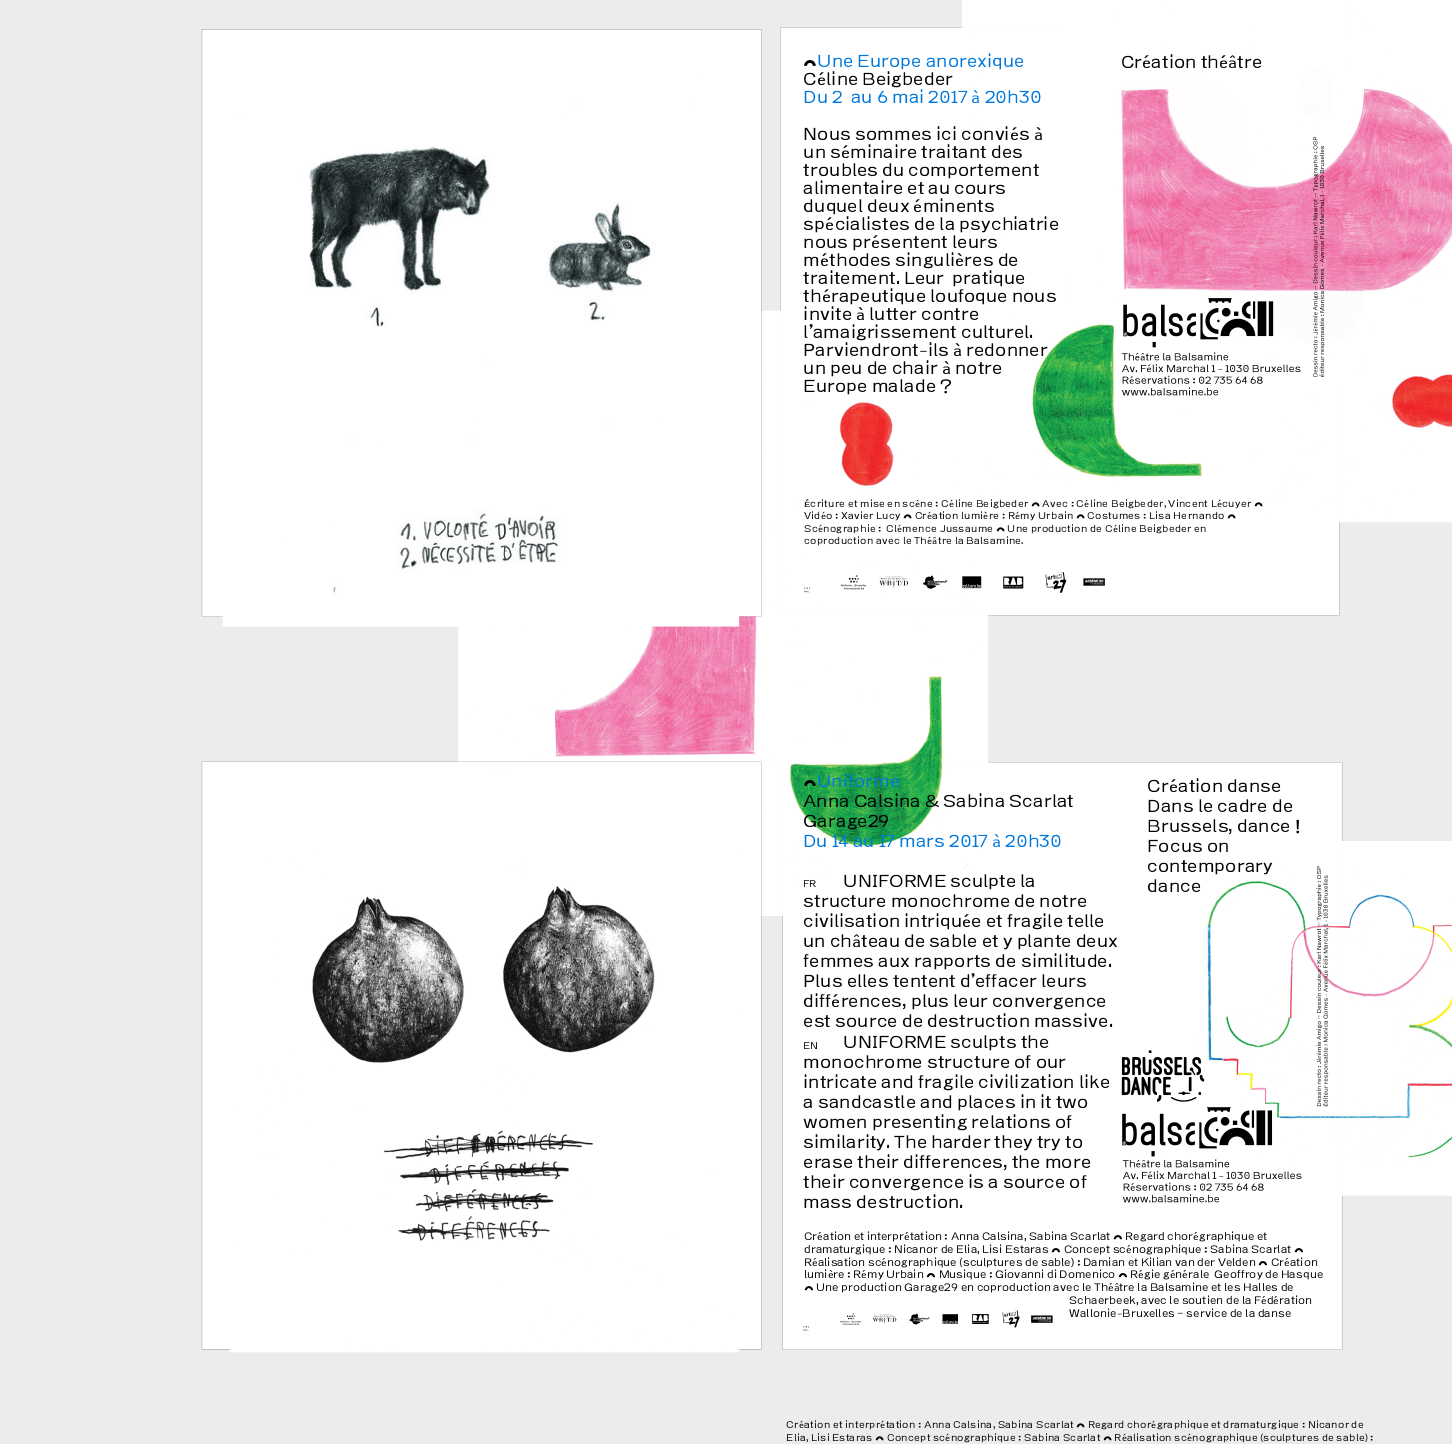 flyers/flyers-serie3-1v4.png